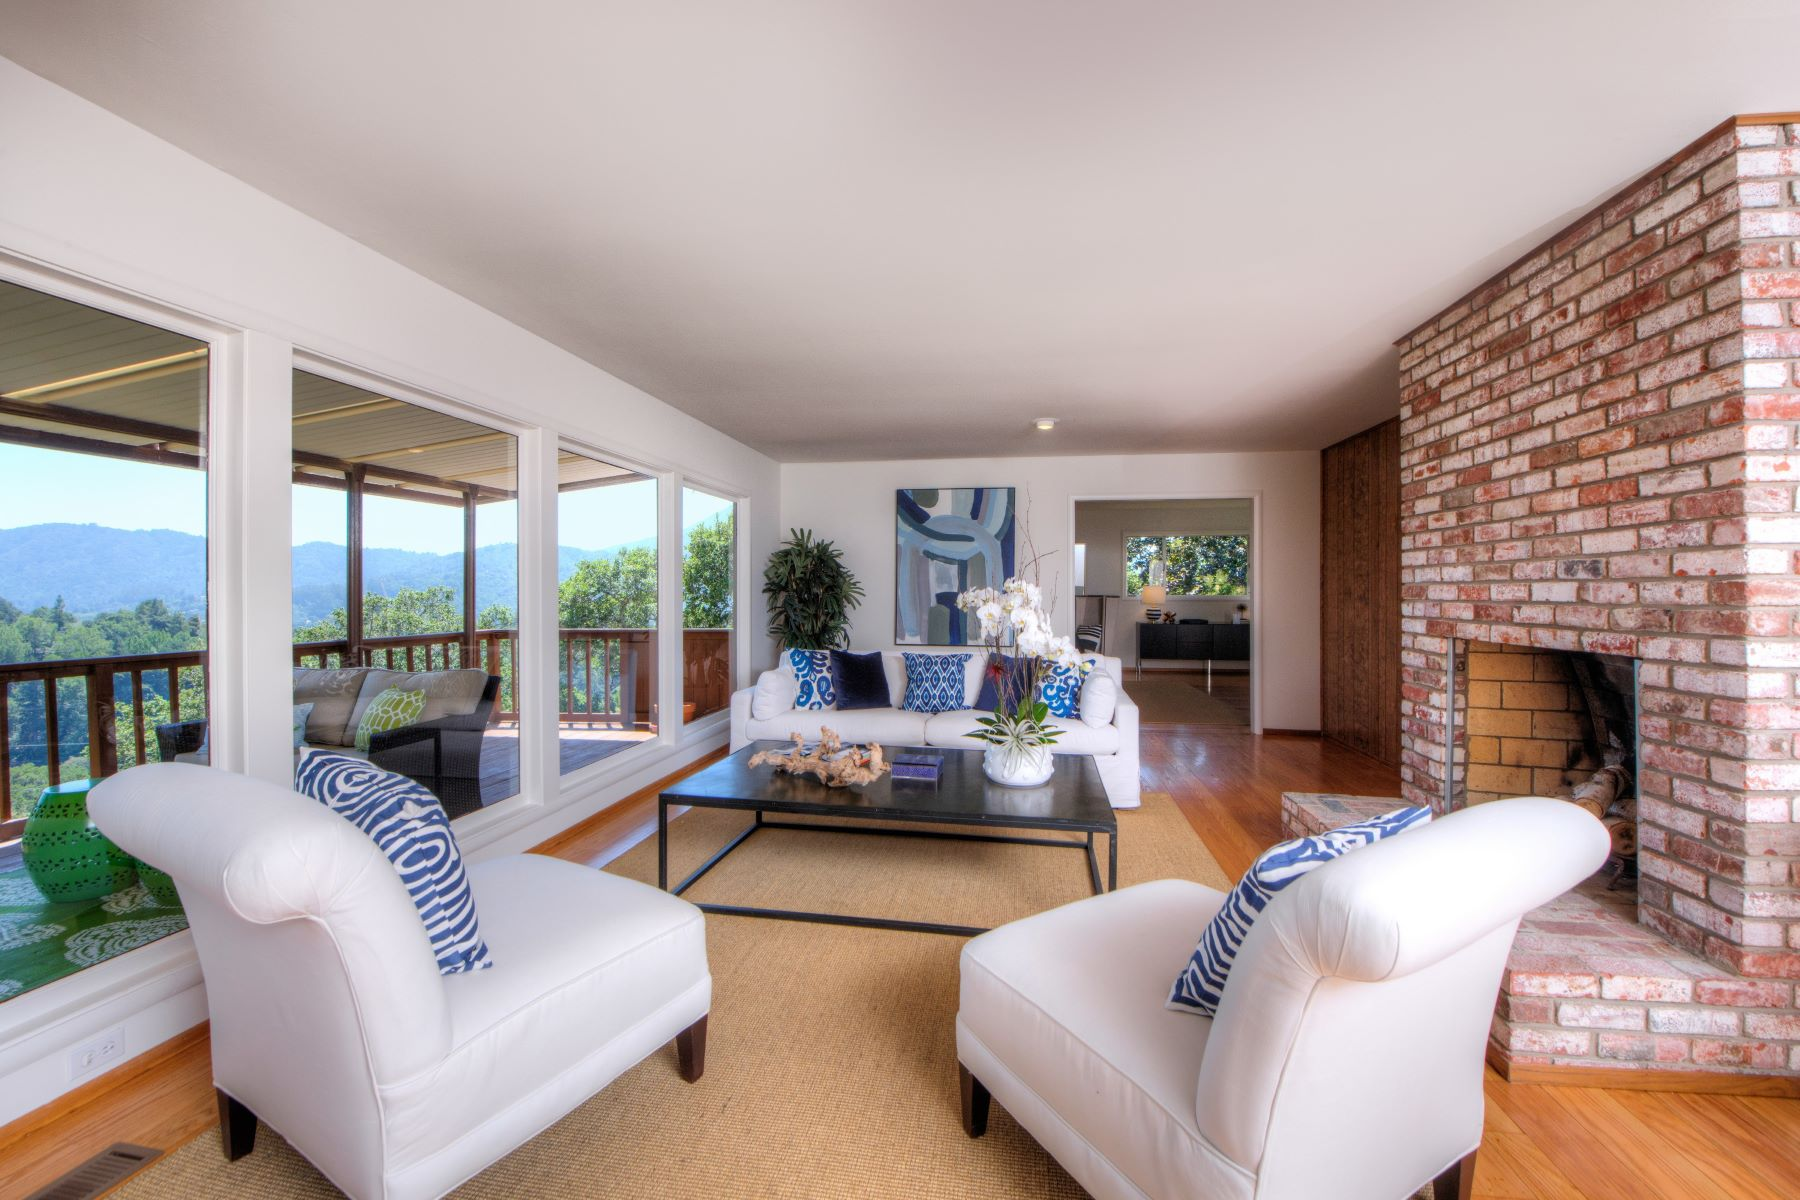 Single Family Home for Sale at Sunny Greenbrae Home 65 Corte Patencio Greenbrae, California 94904 United States